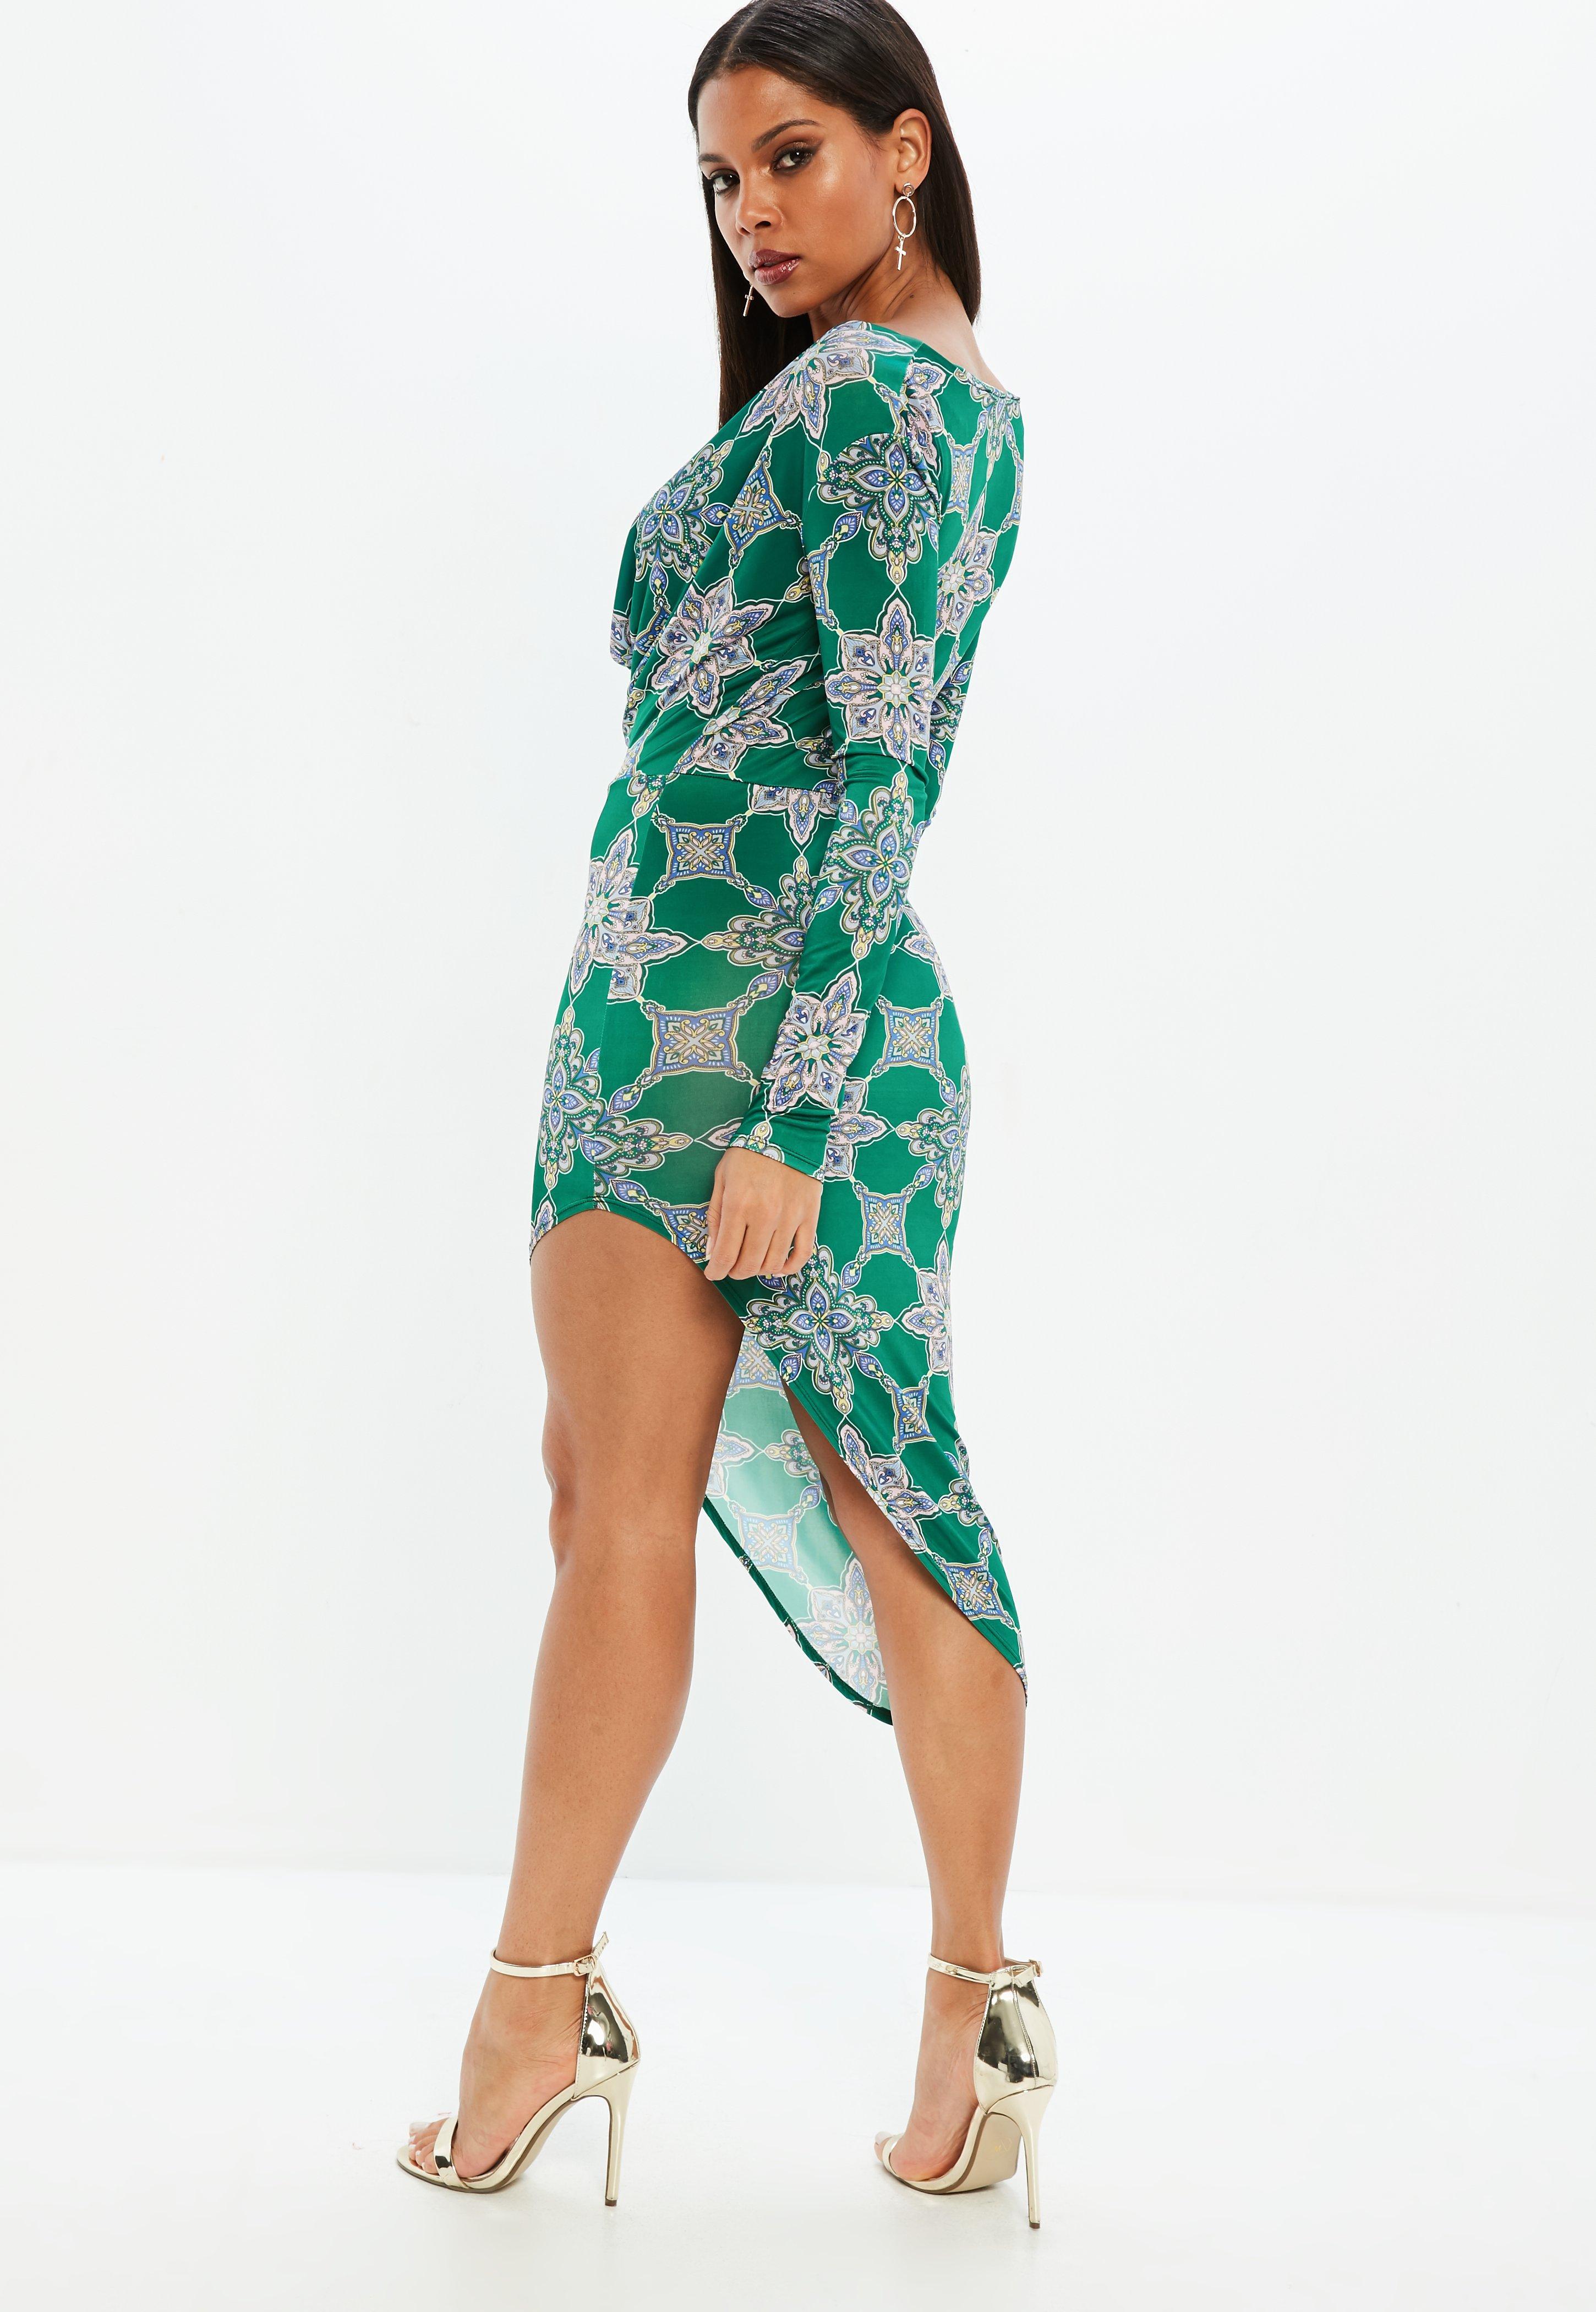 Missguided Tile Print Cowl Slinky Dress 2018 Cheap Online MrUScoG9